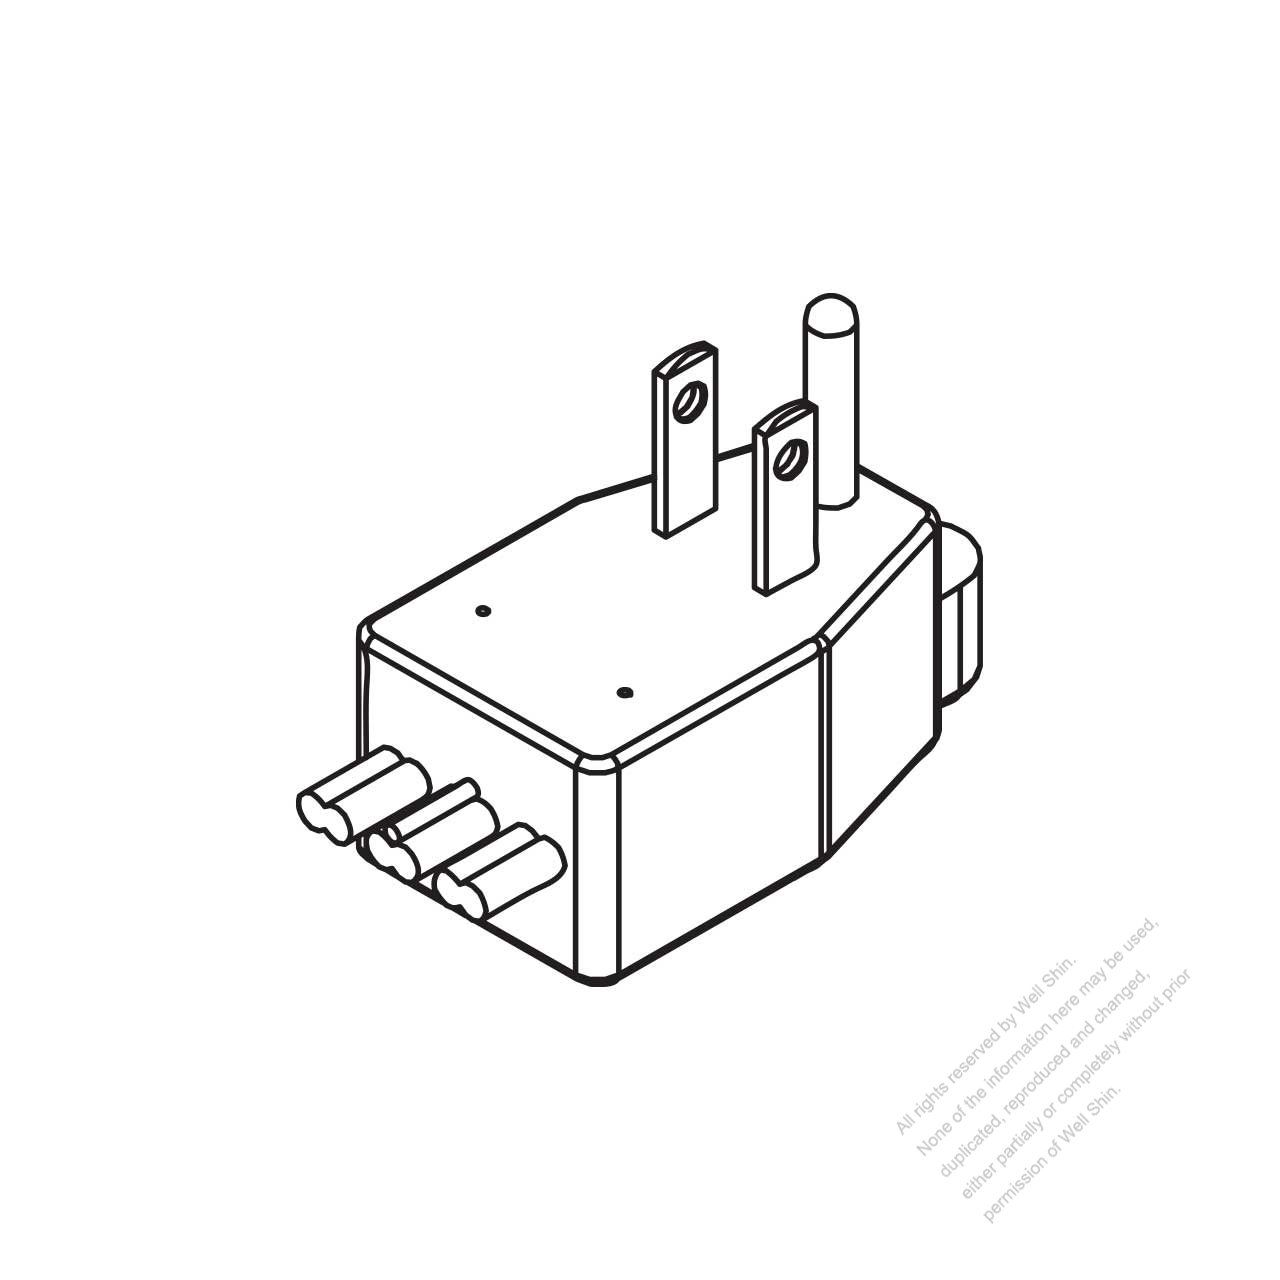 usa canada nema 5 15p elbow ac plug 2 p 3 wire grounding 15a 125v 250 Volt Plug Wiring usa canada nema 5 15p elbow ac plug 2 p 3 wire